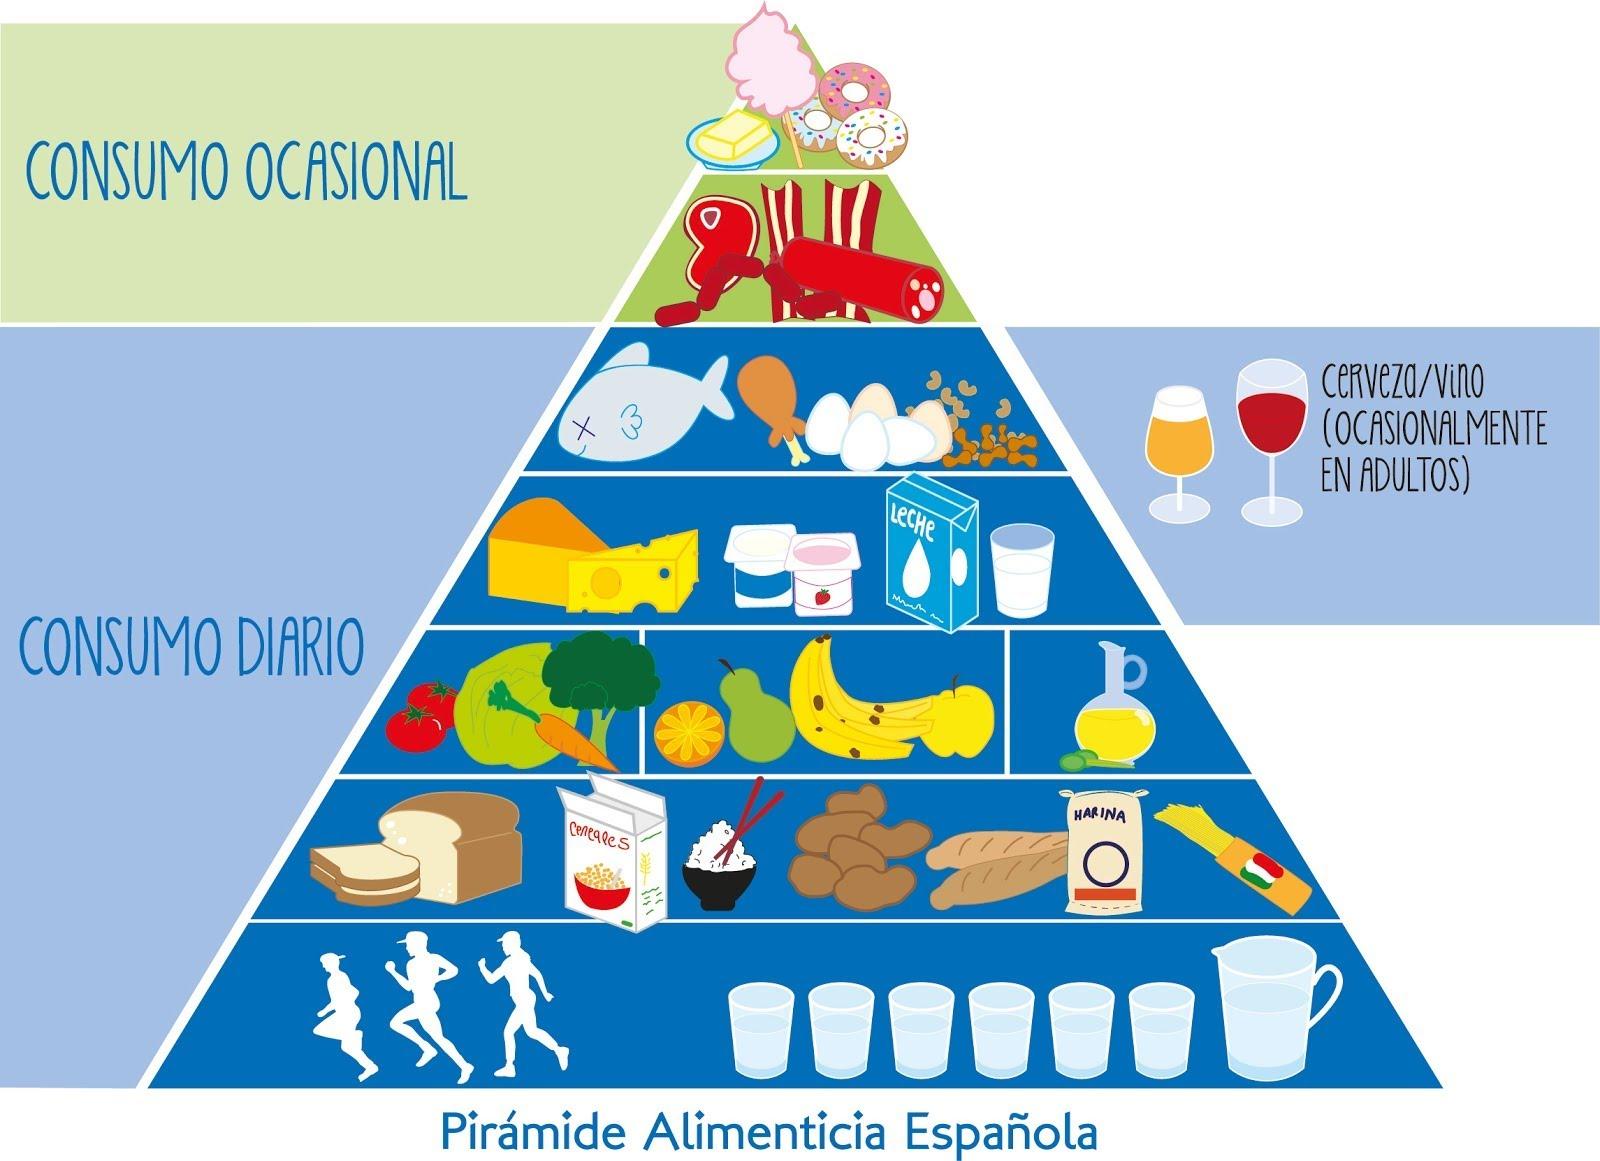 dieta raciones la vida biloba